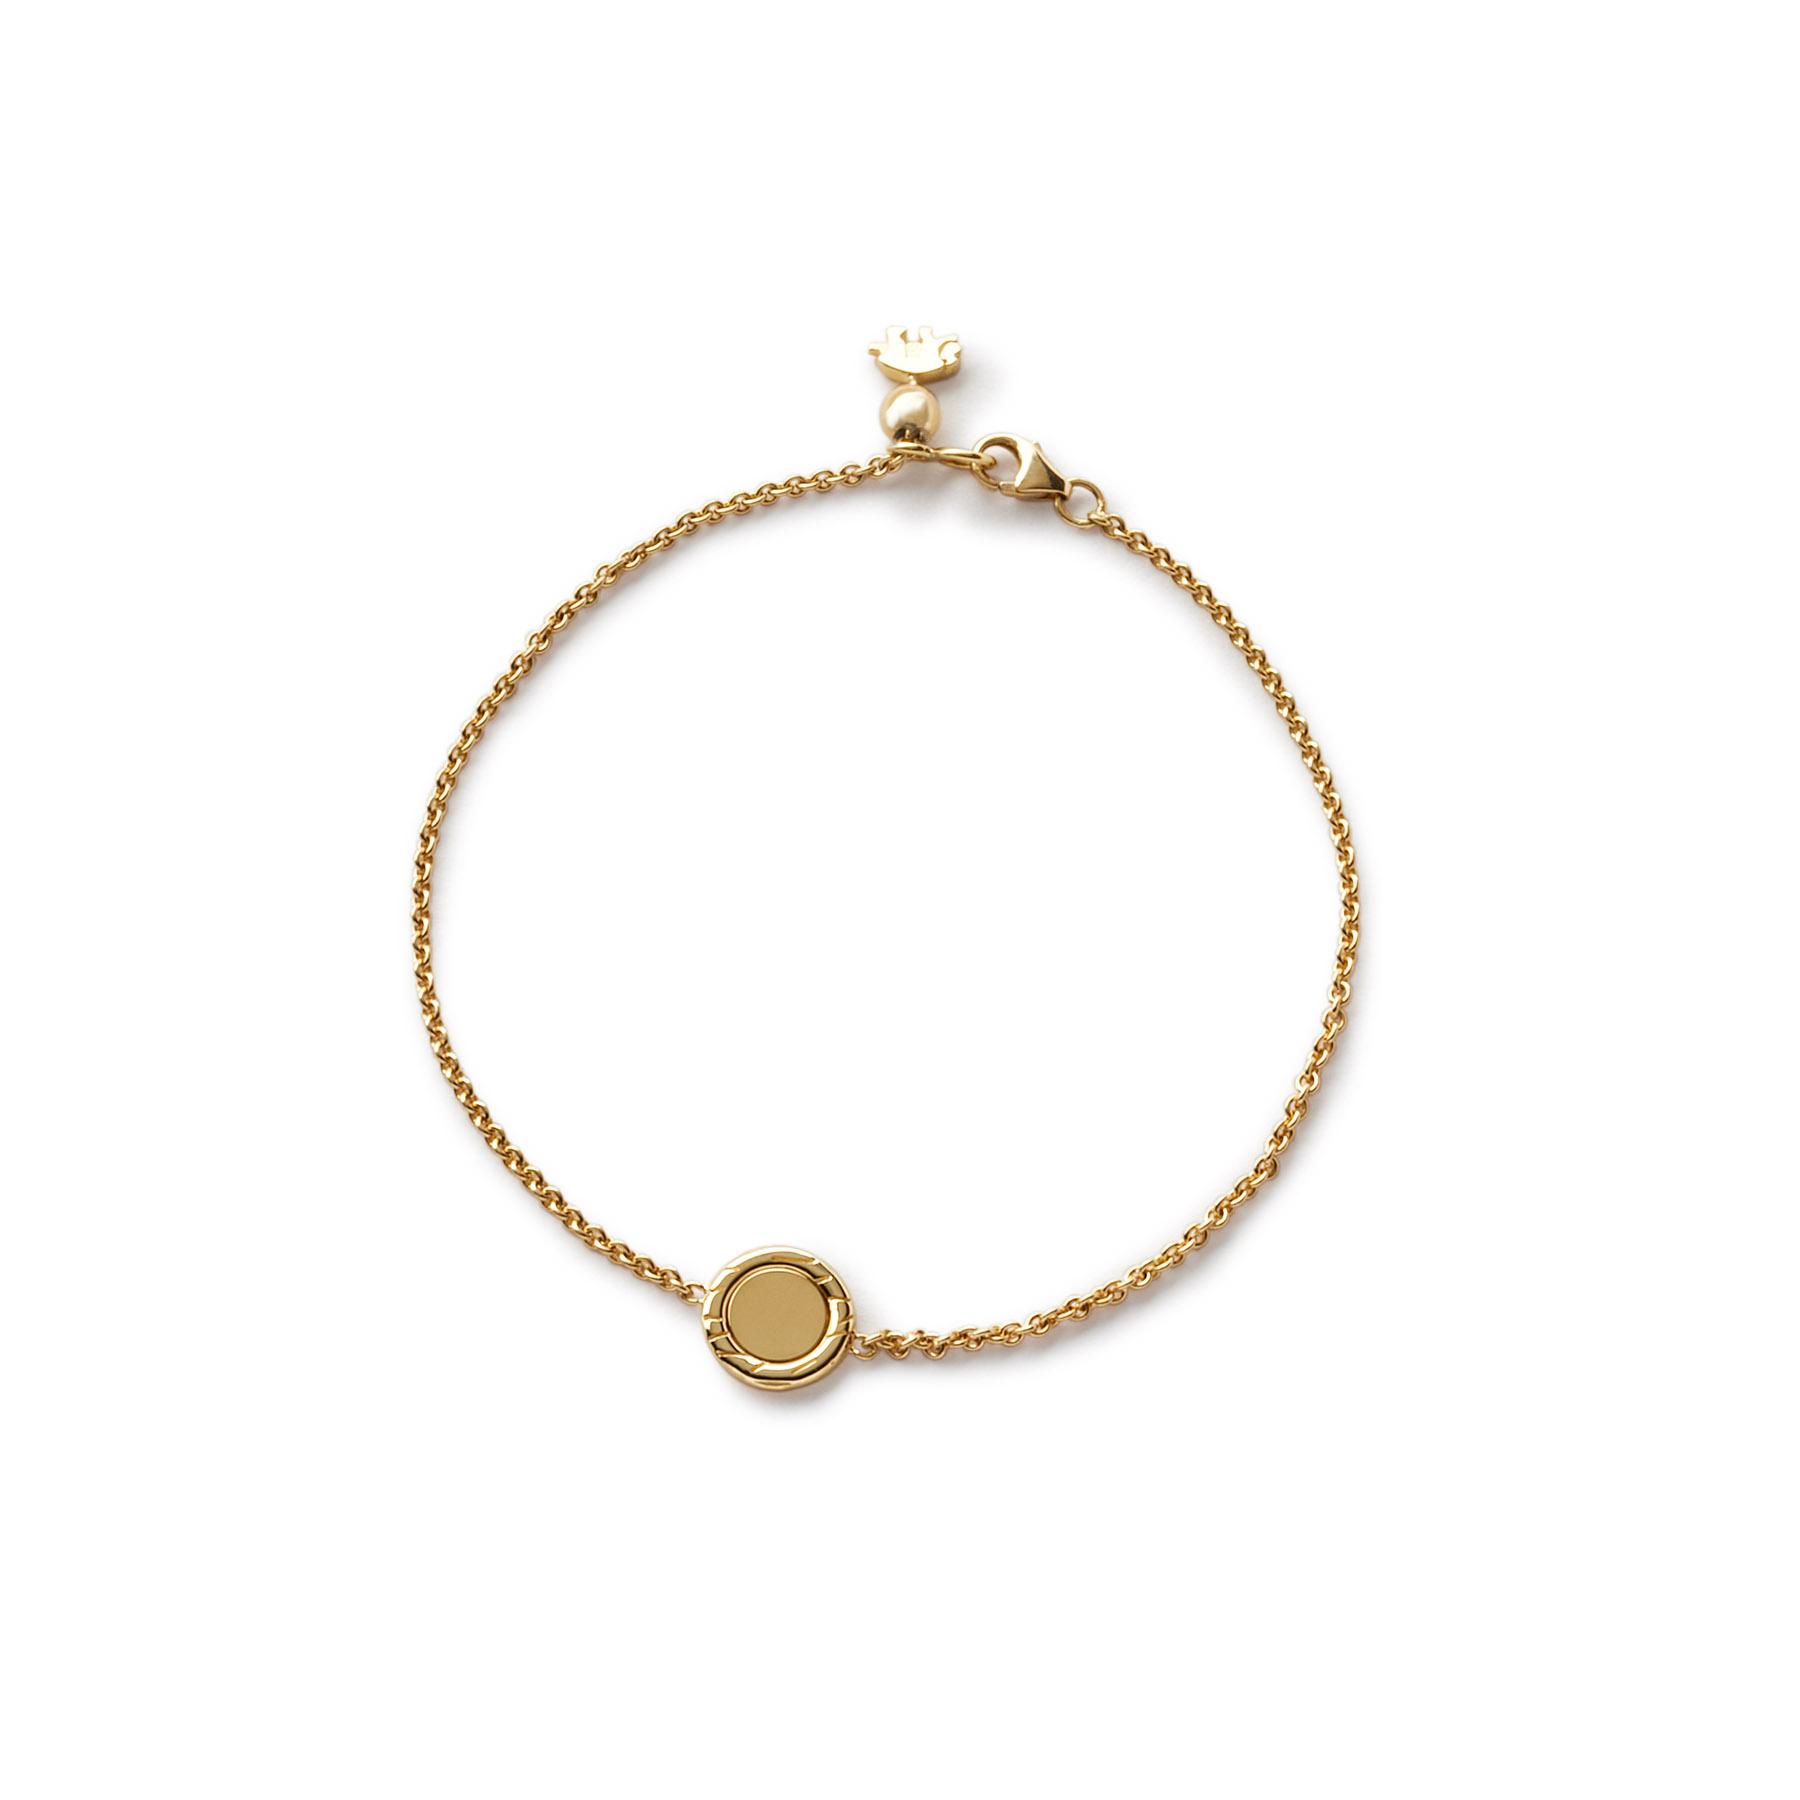 closed-circle-fur-bracelet-FC11A-1.jpg